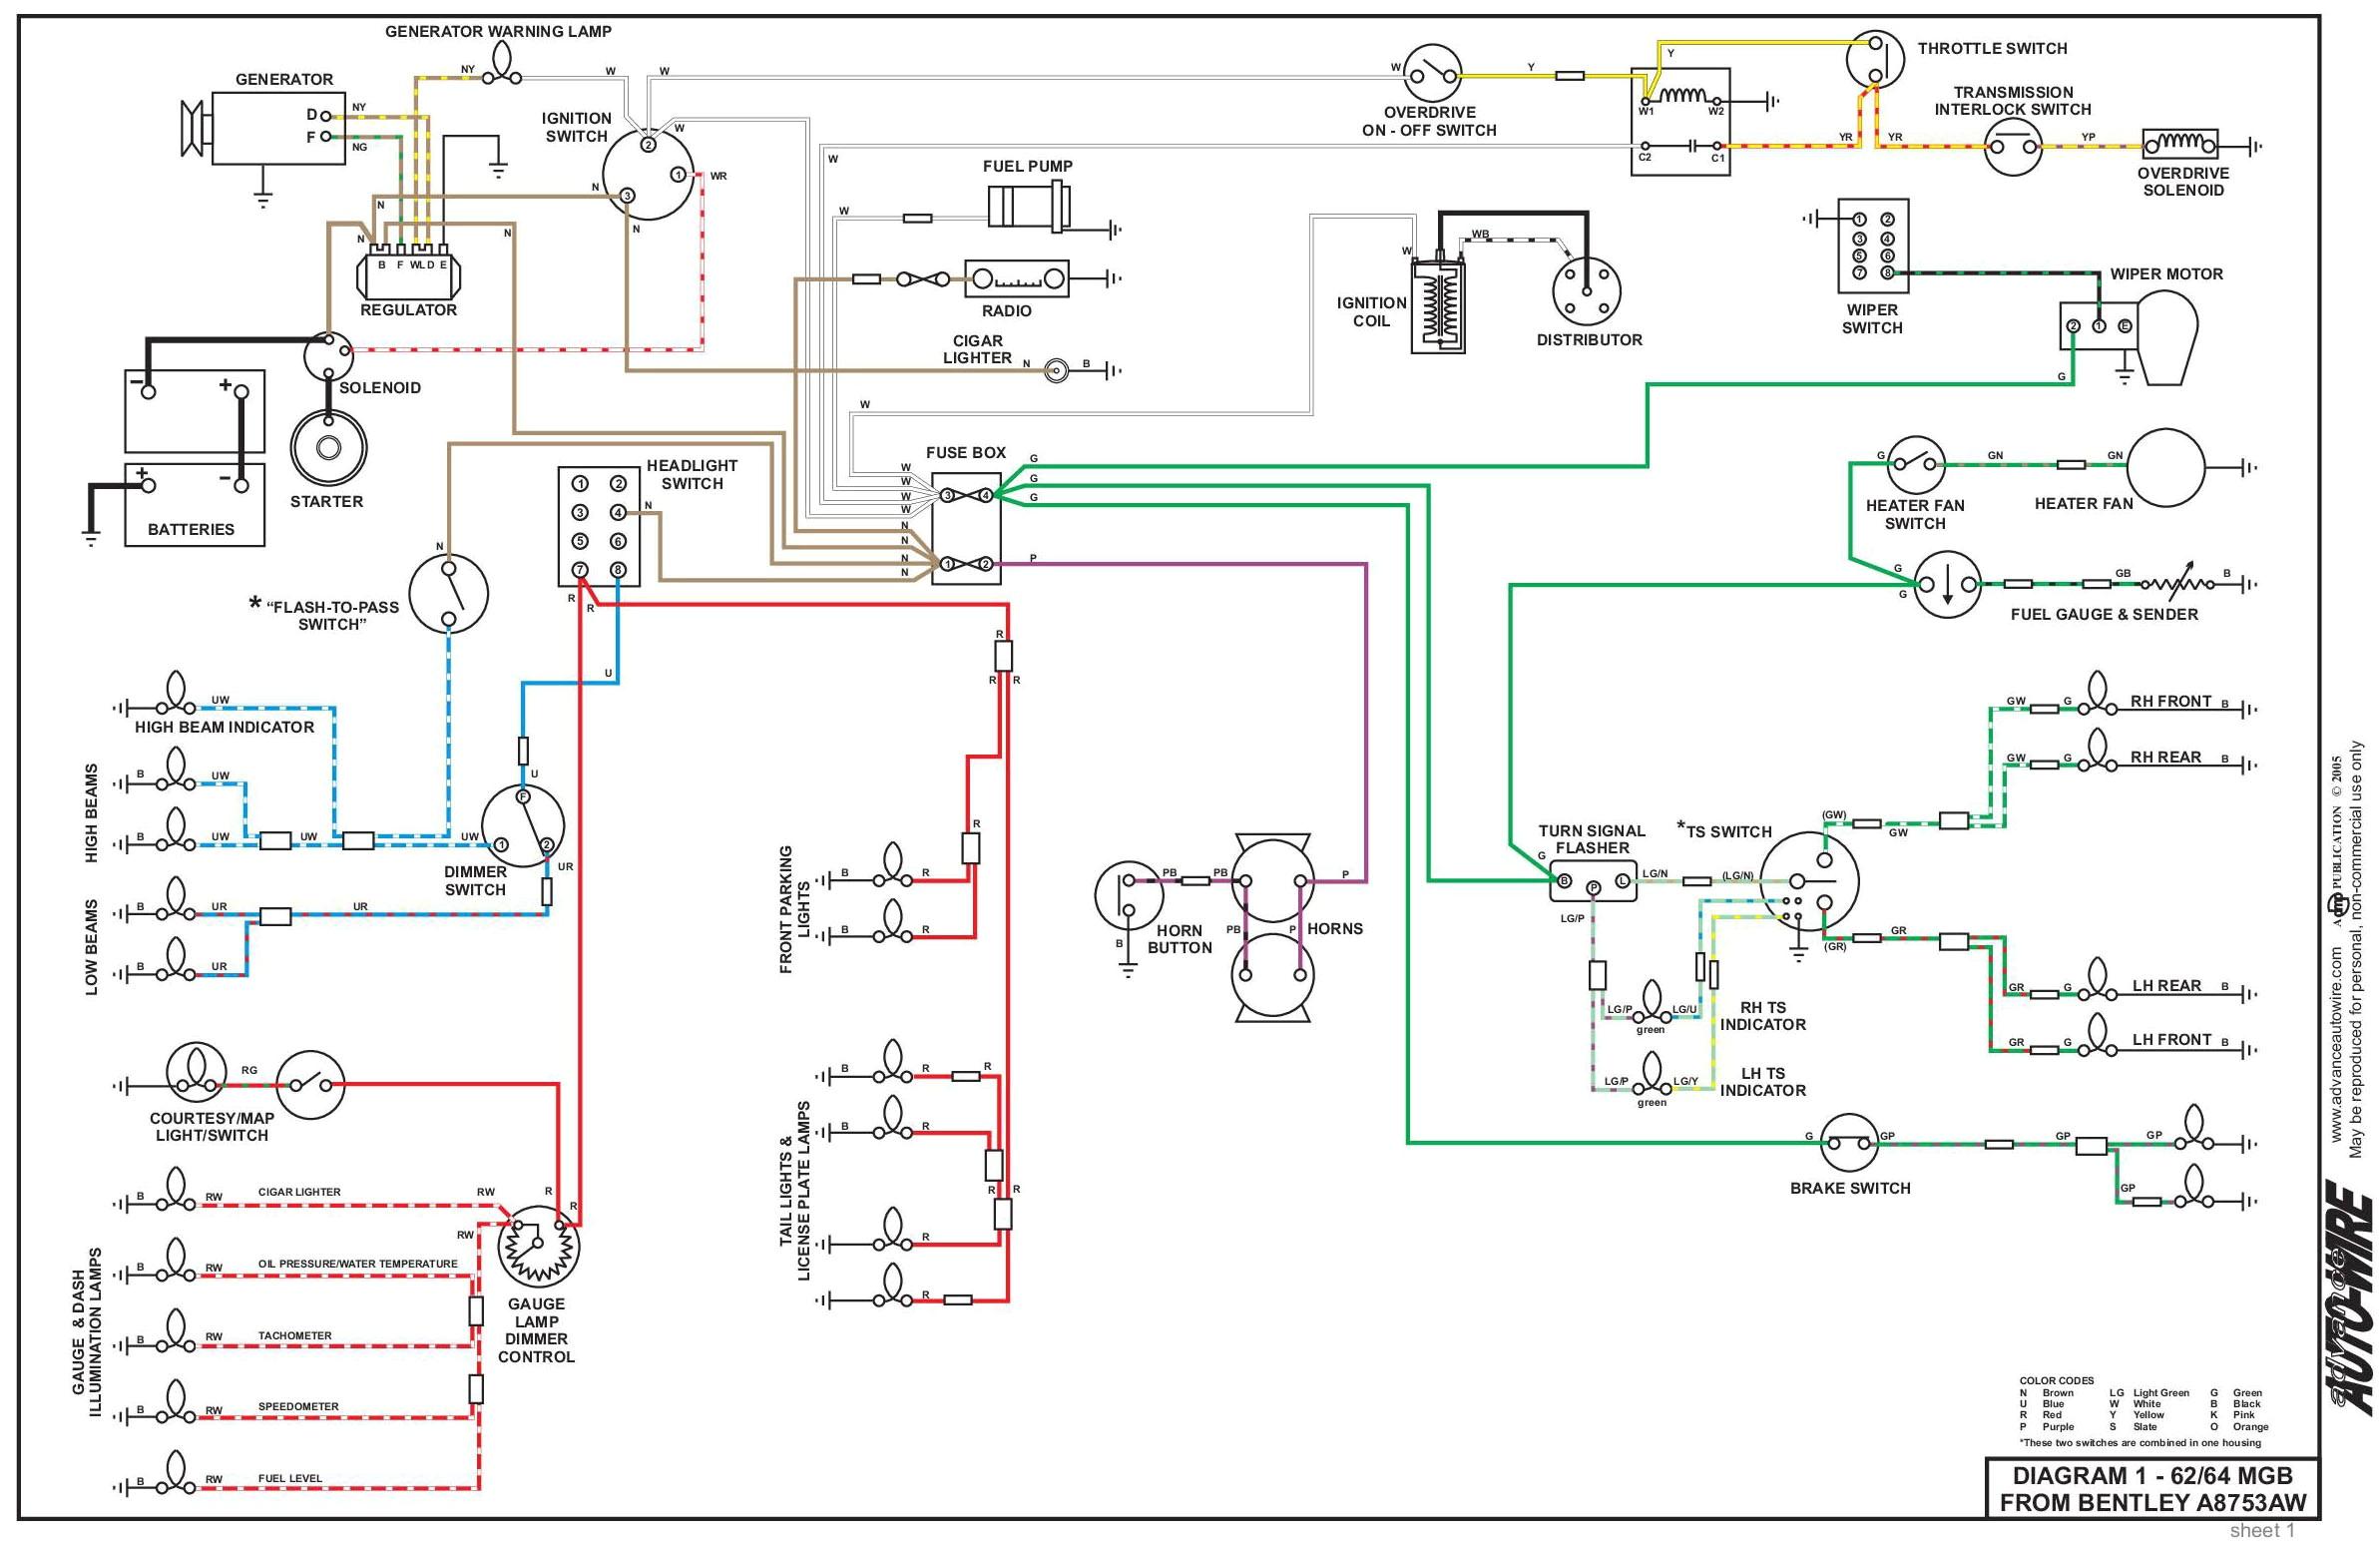 mgb wiring diagram elegant 1972 mgb wiring diagram explore schematic wiring diagram e280a2 of mgb wiring diagram jpg